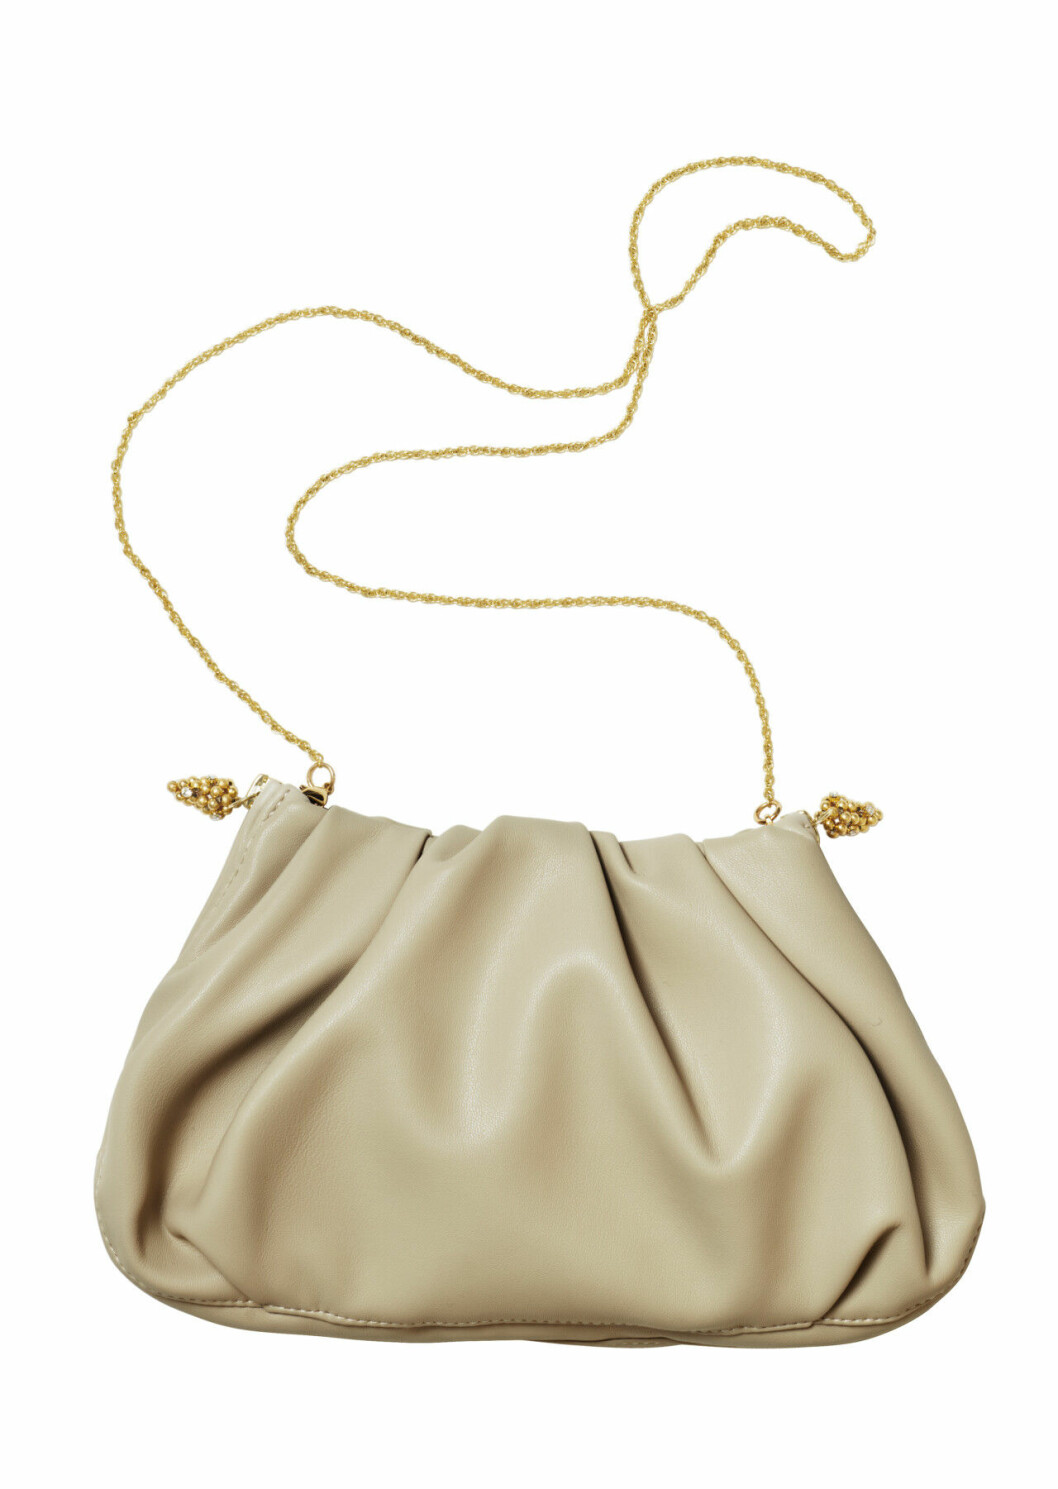 H&M conscious exclusive SS20 – beige väska